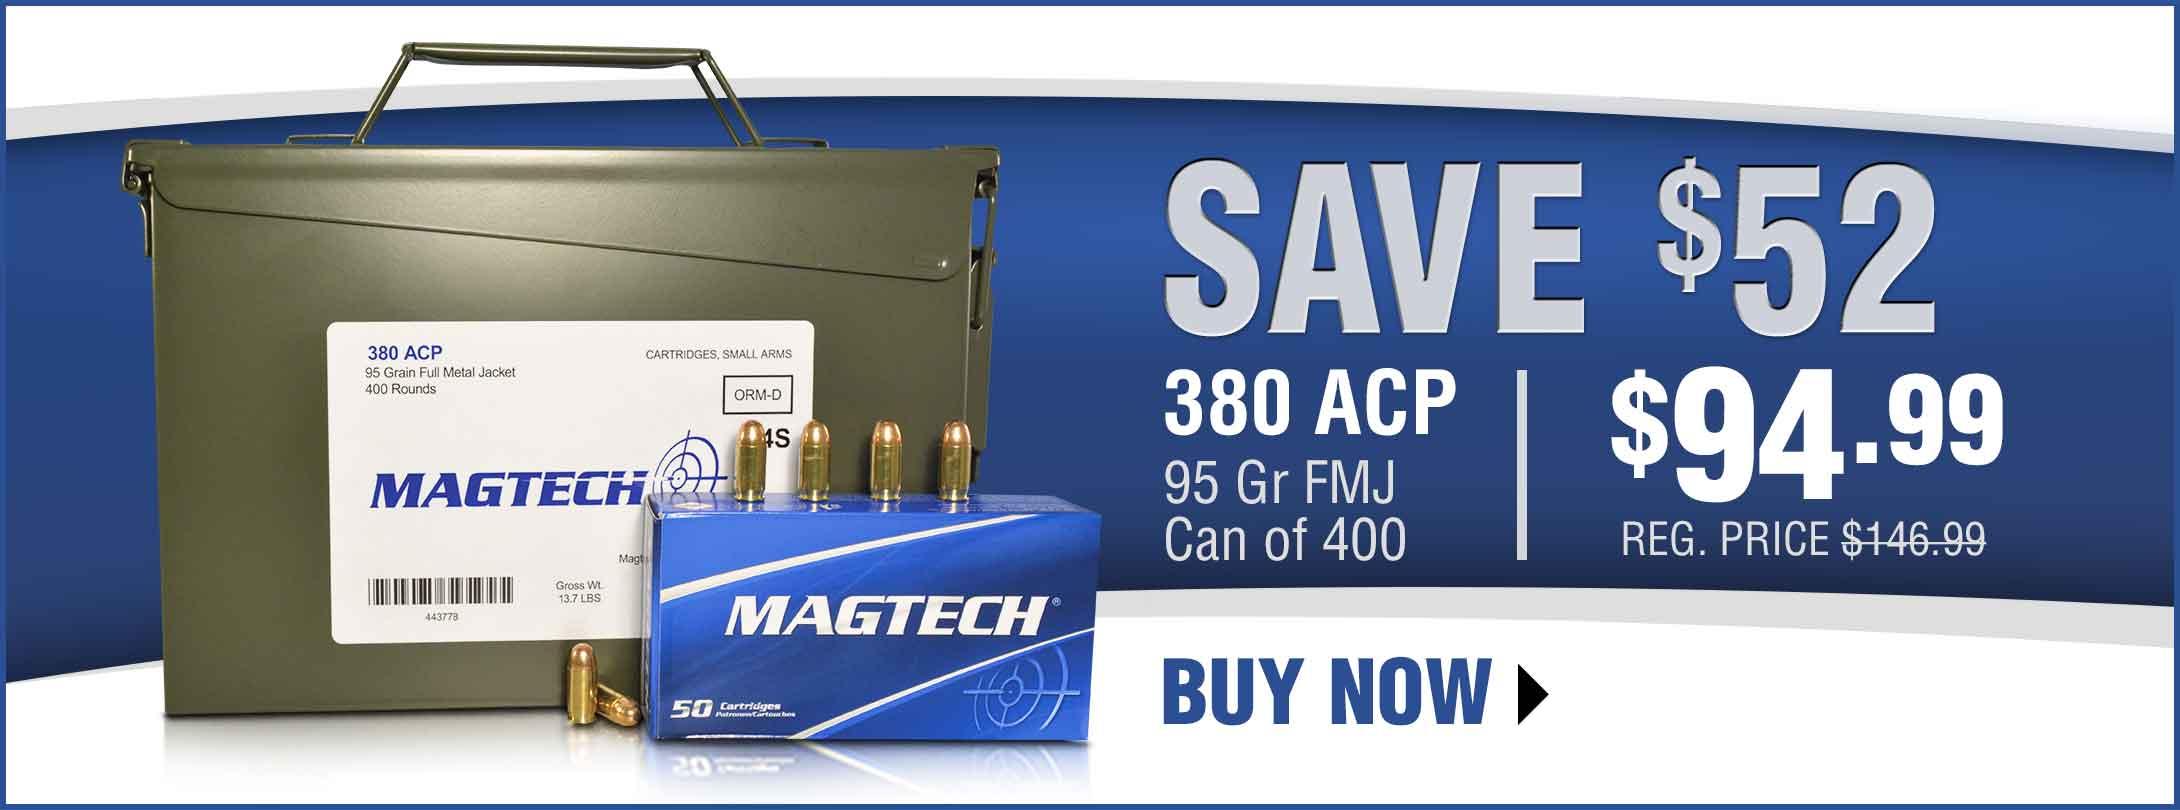 Save on Magtech 380 ACP Ammo!